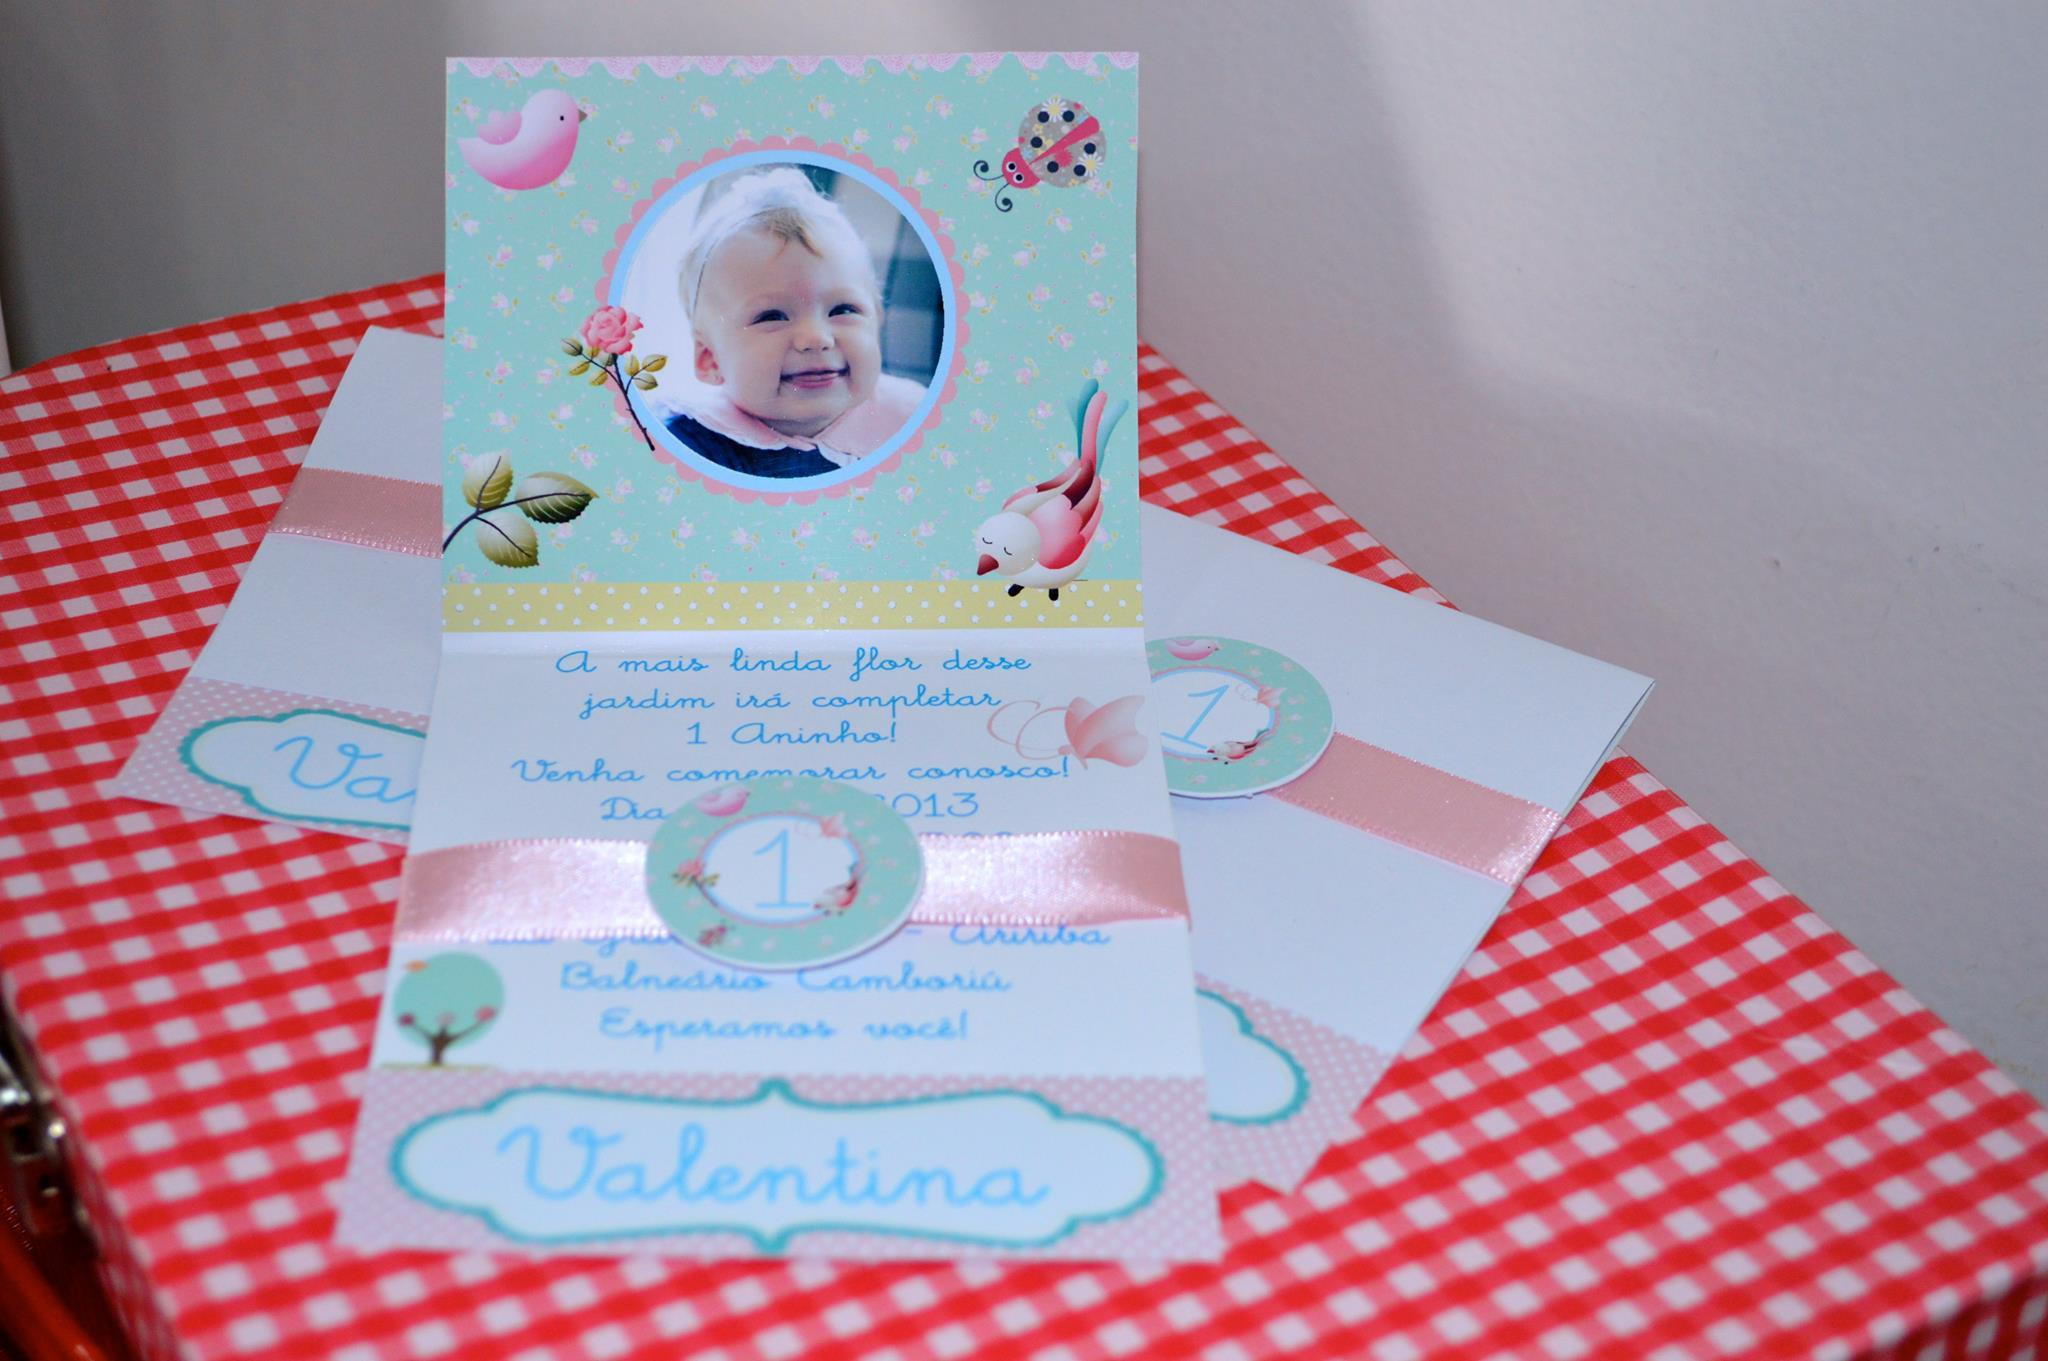 ideias para aniversario jardim encantado:convite-jardim-encantado-3-festa-jardim-encantado